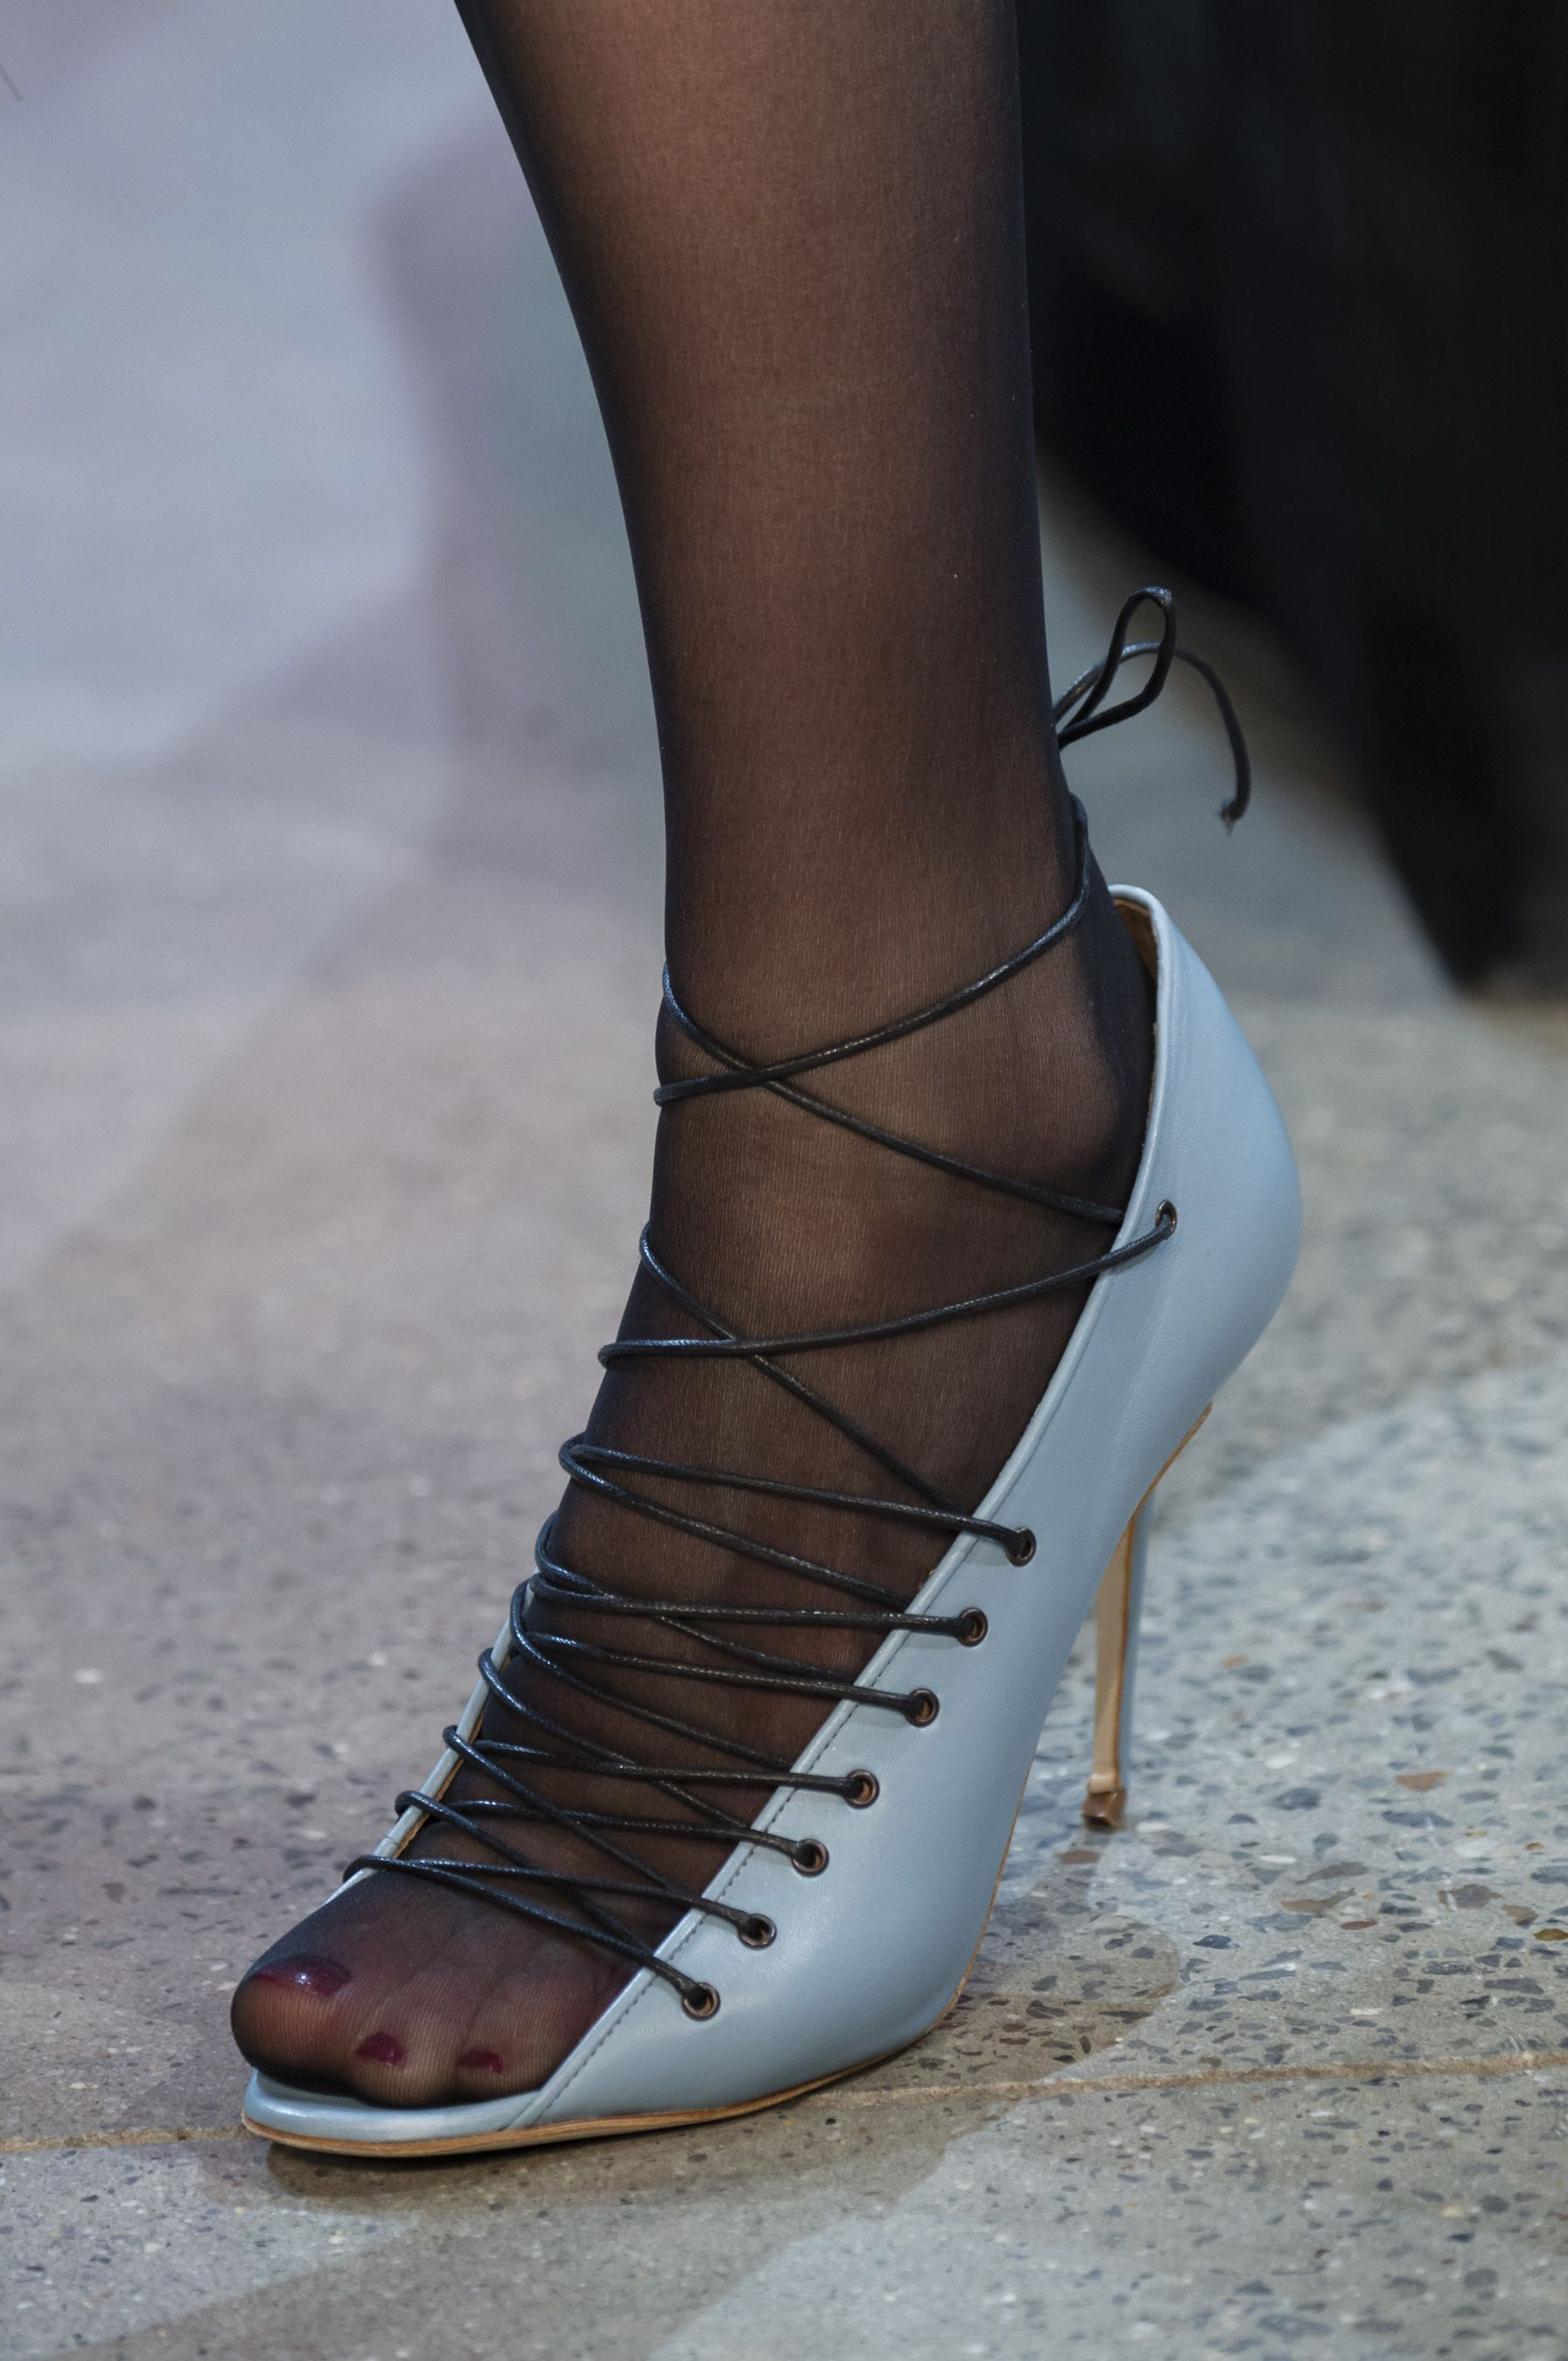 melissa-jason-wu-artemis-sandal - Glam York